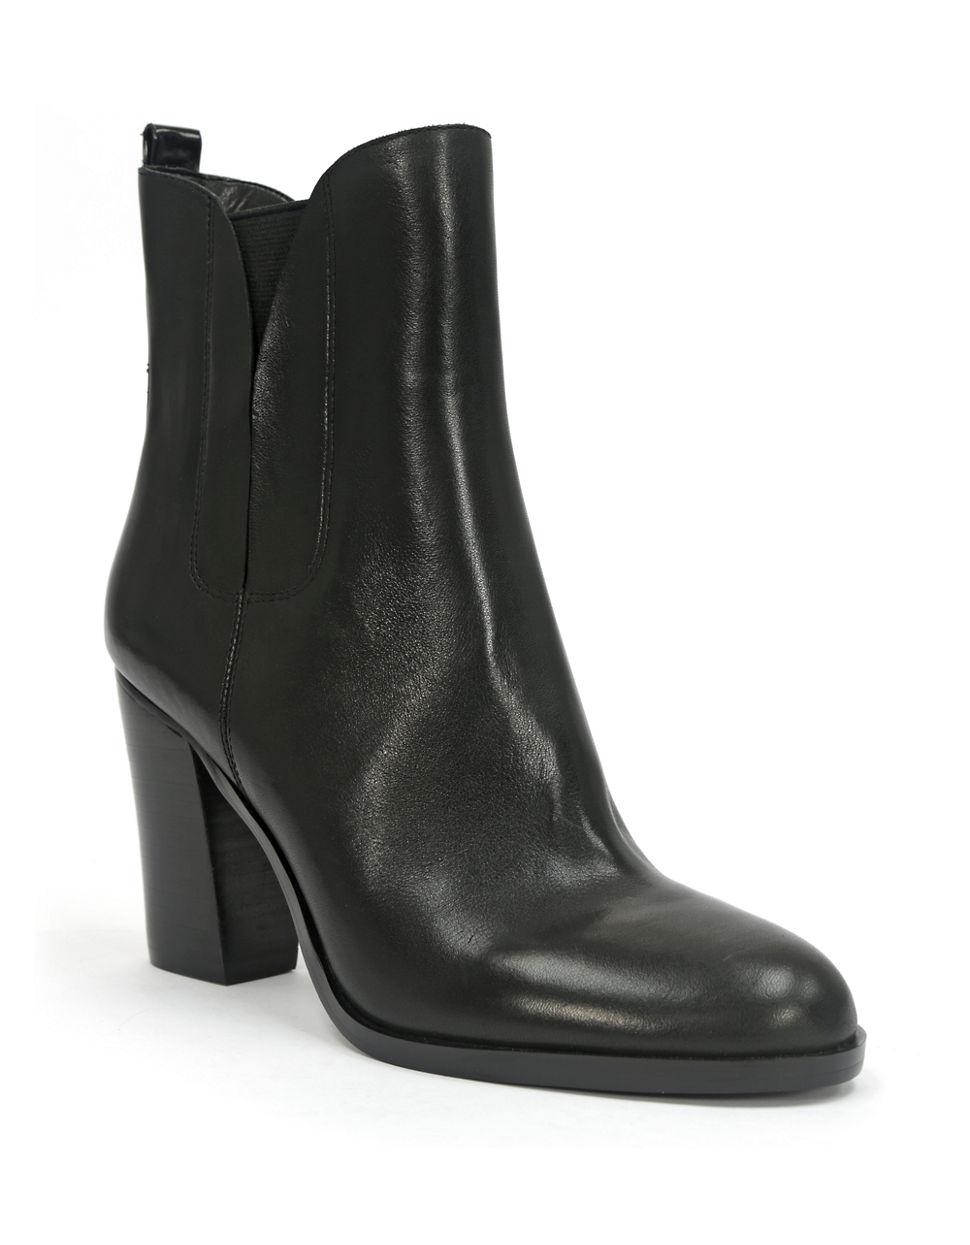 tahari foxy high heel leather boots in black lyst